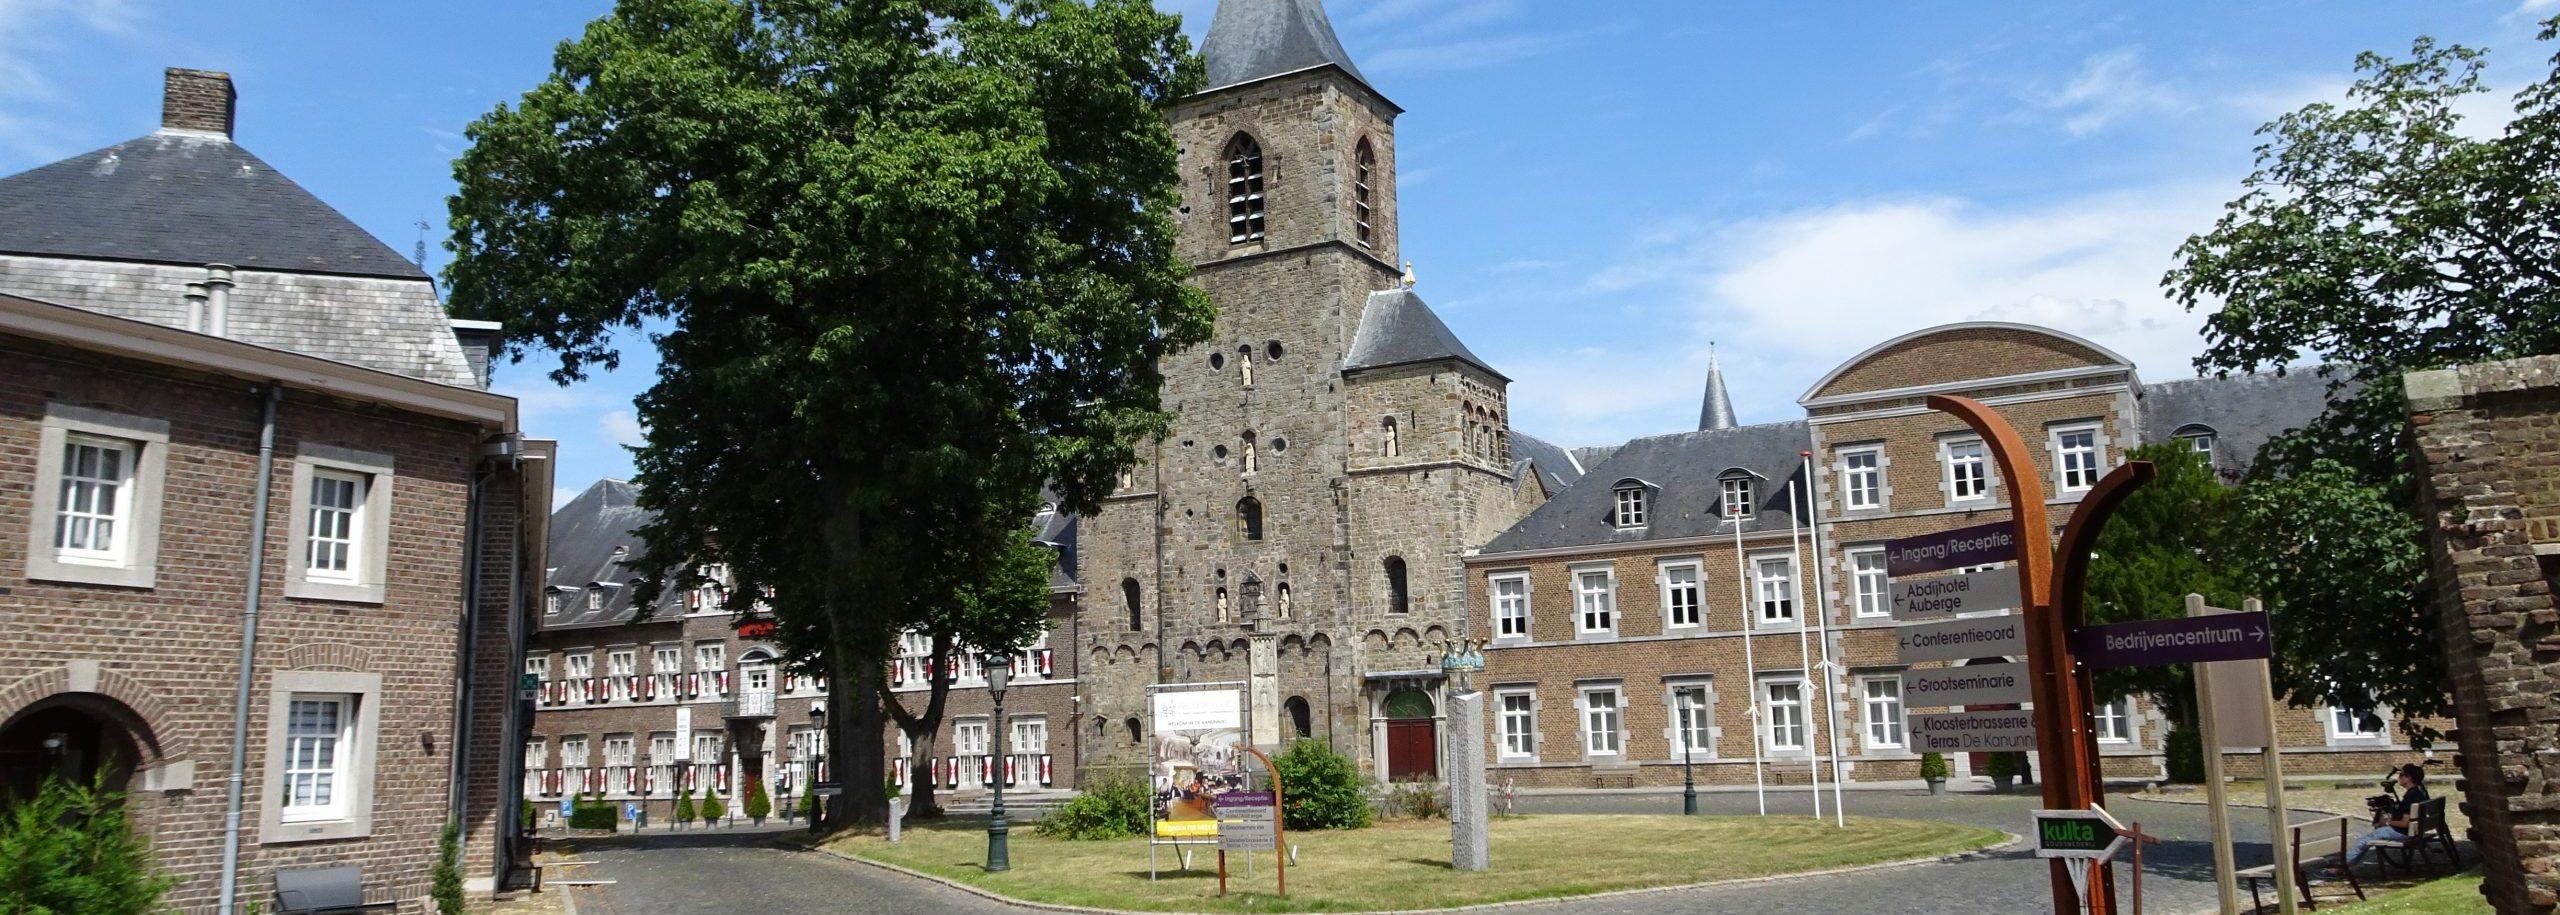 Hertoglimburgpad